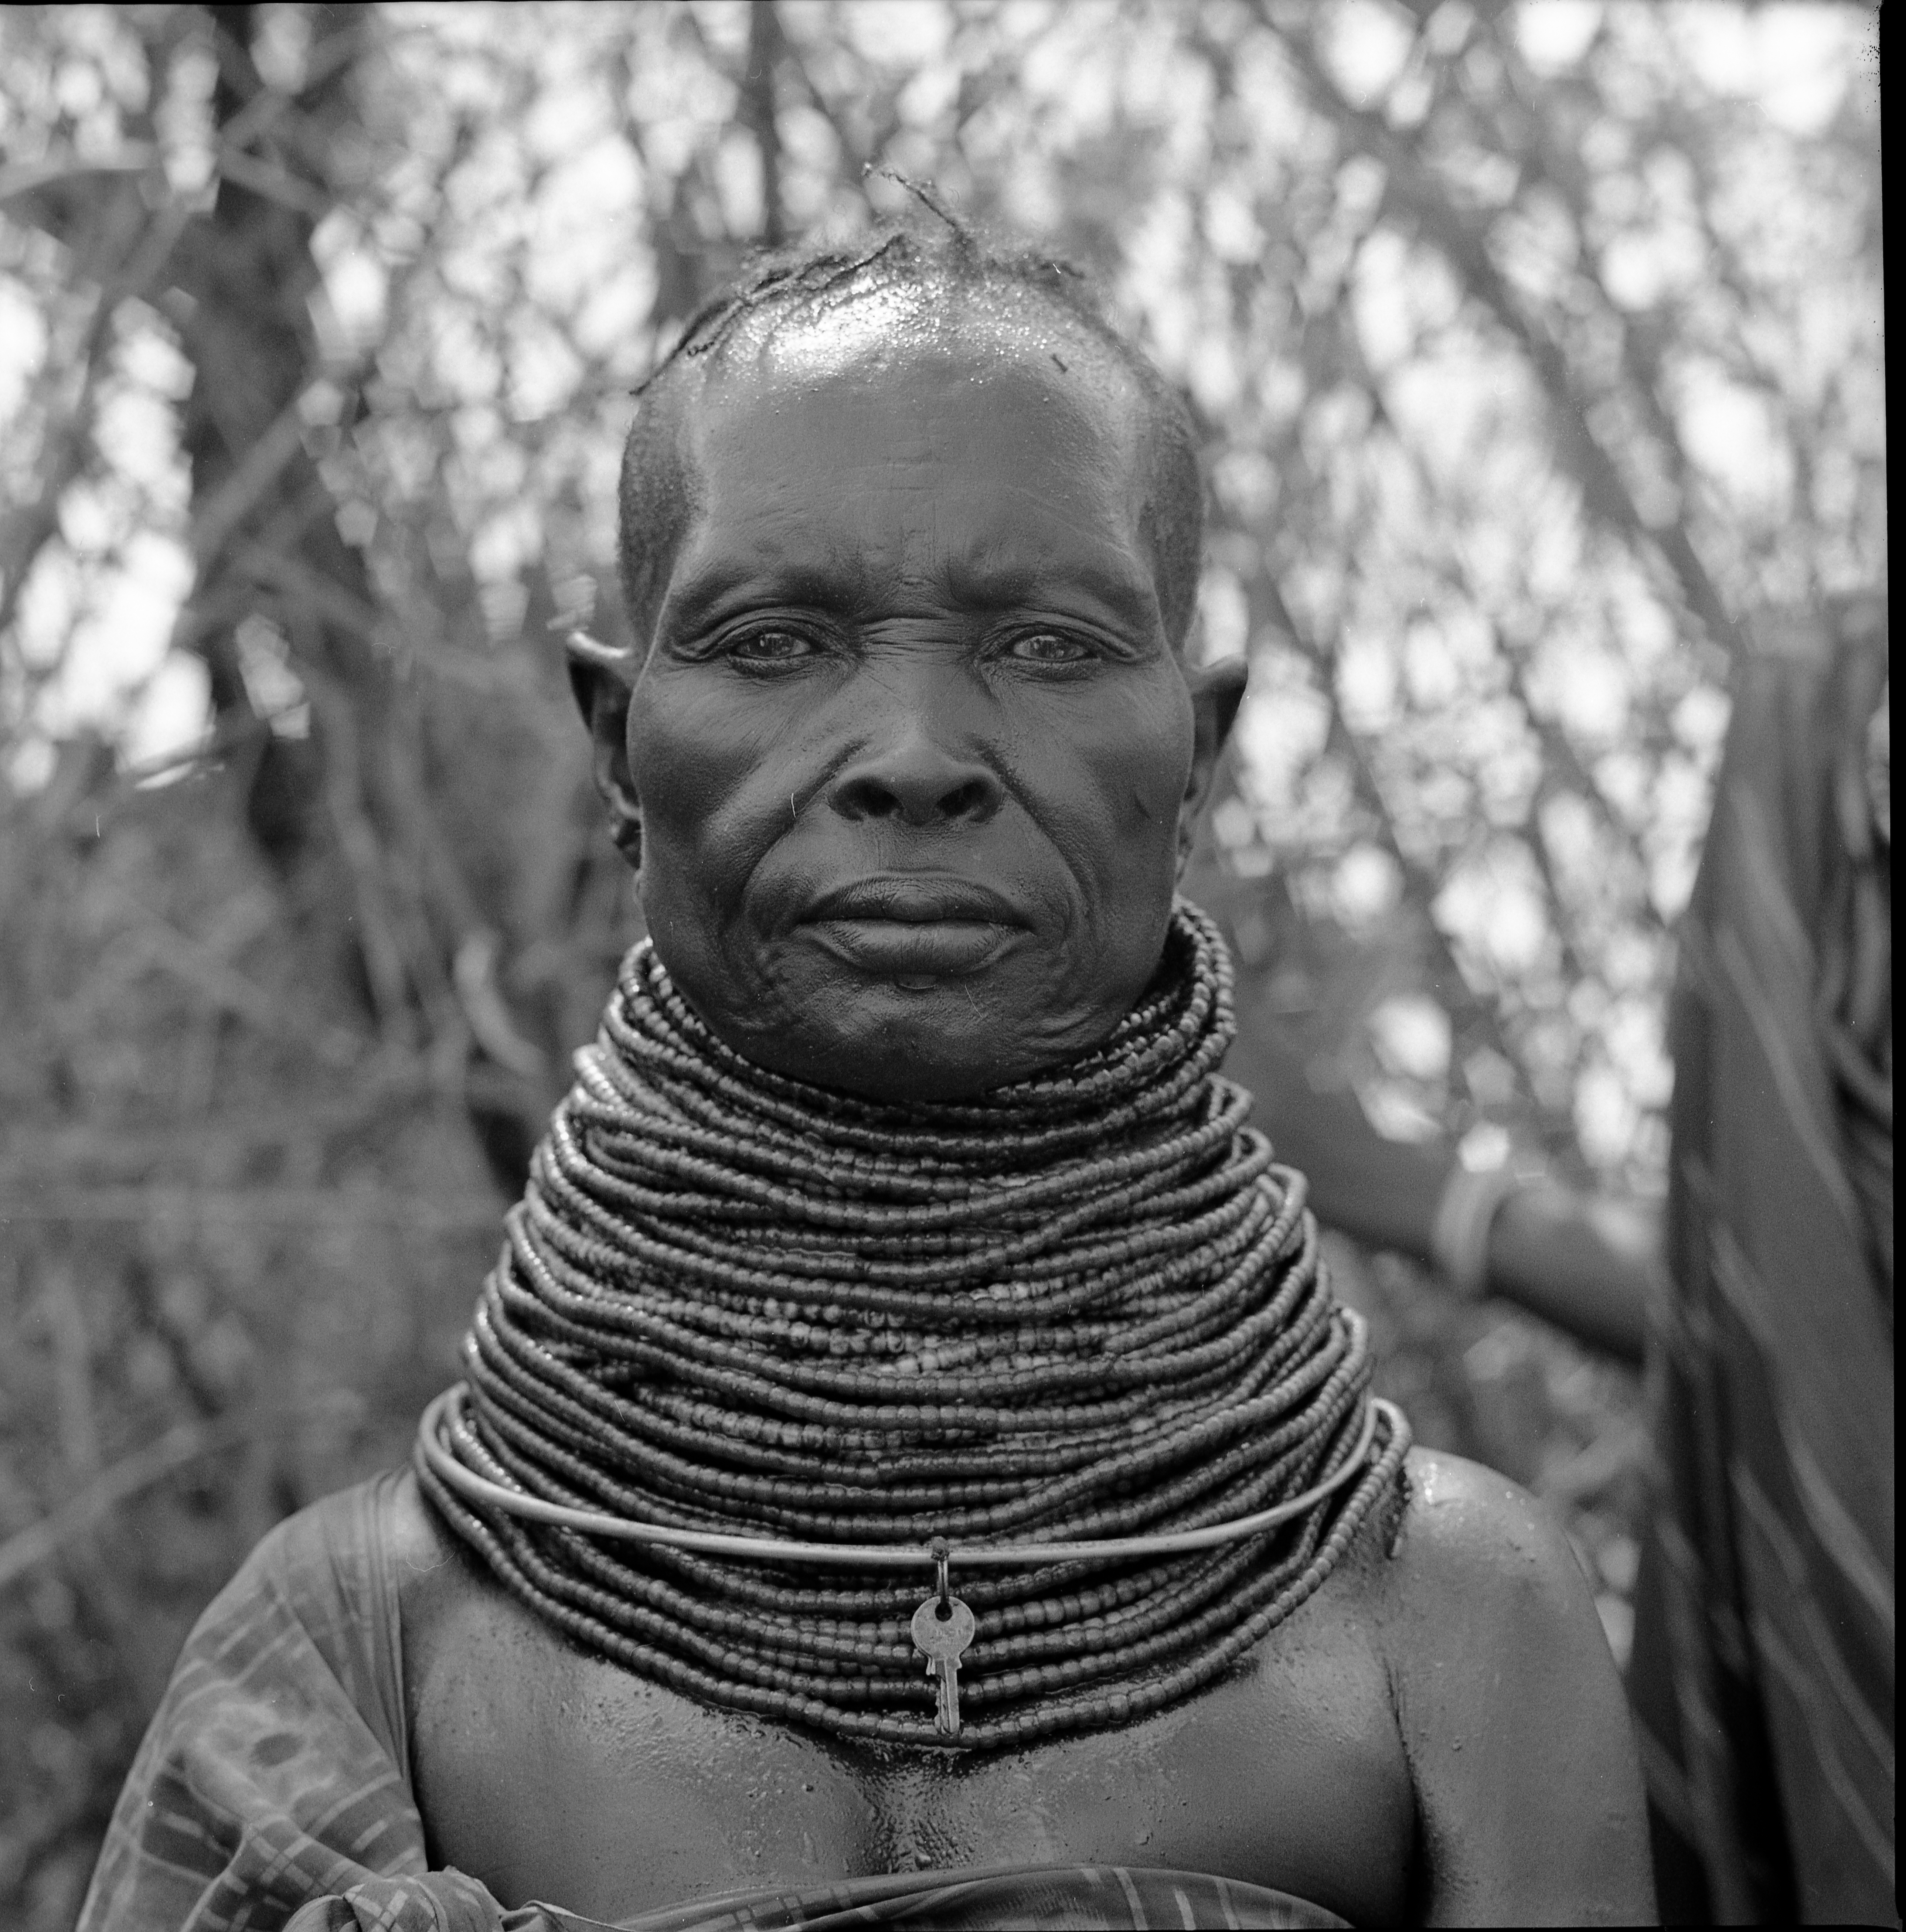 Arot Lokuruka